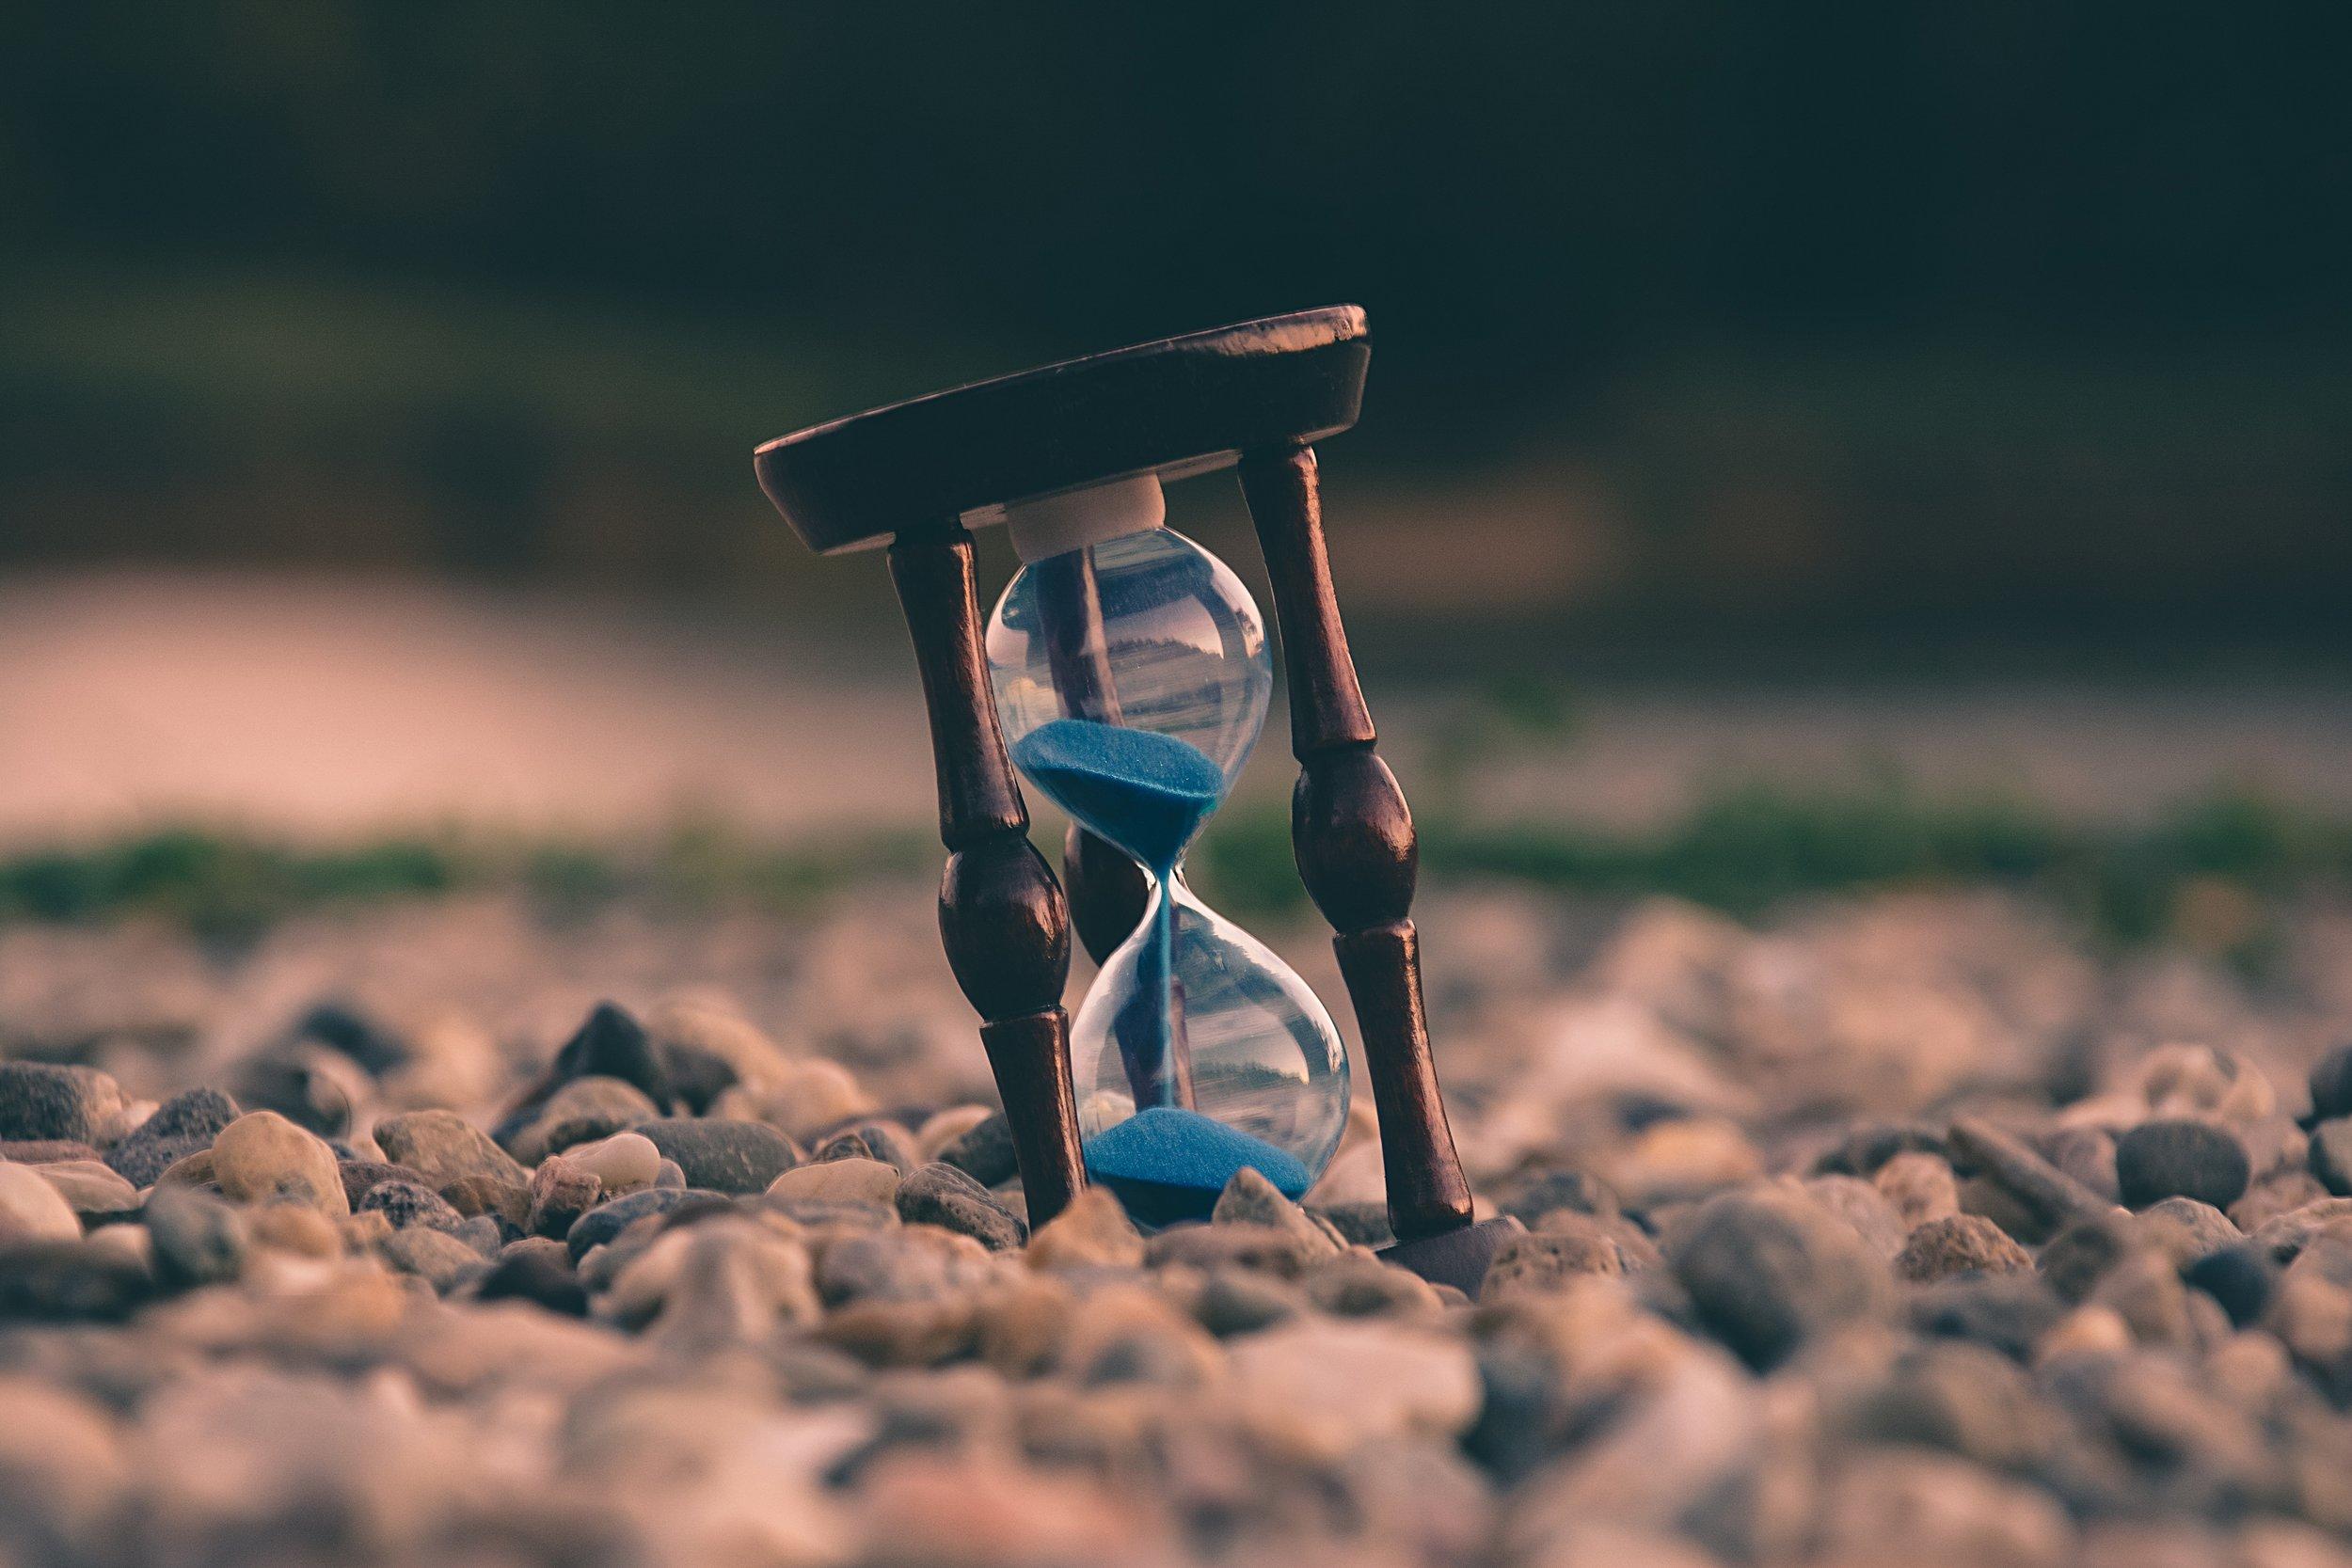 hourglassimage.jpg